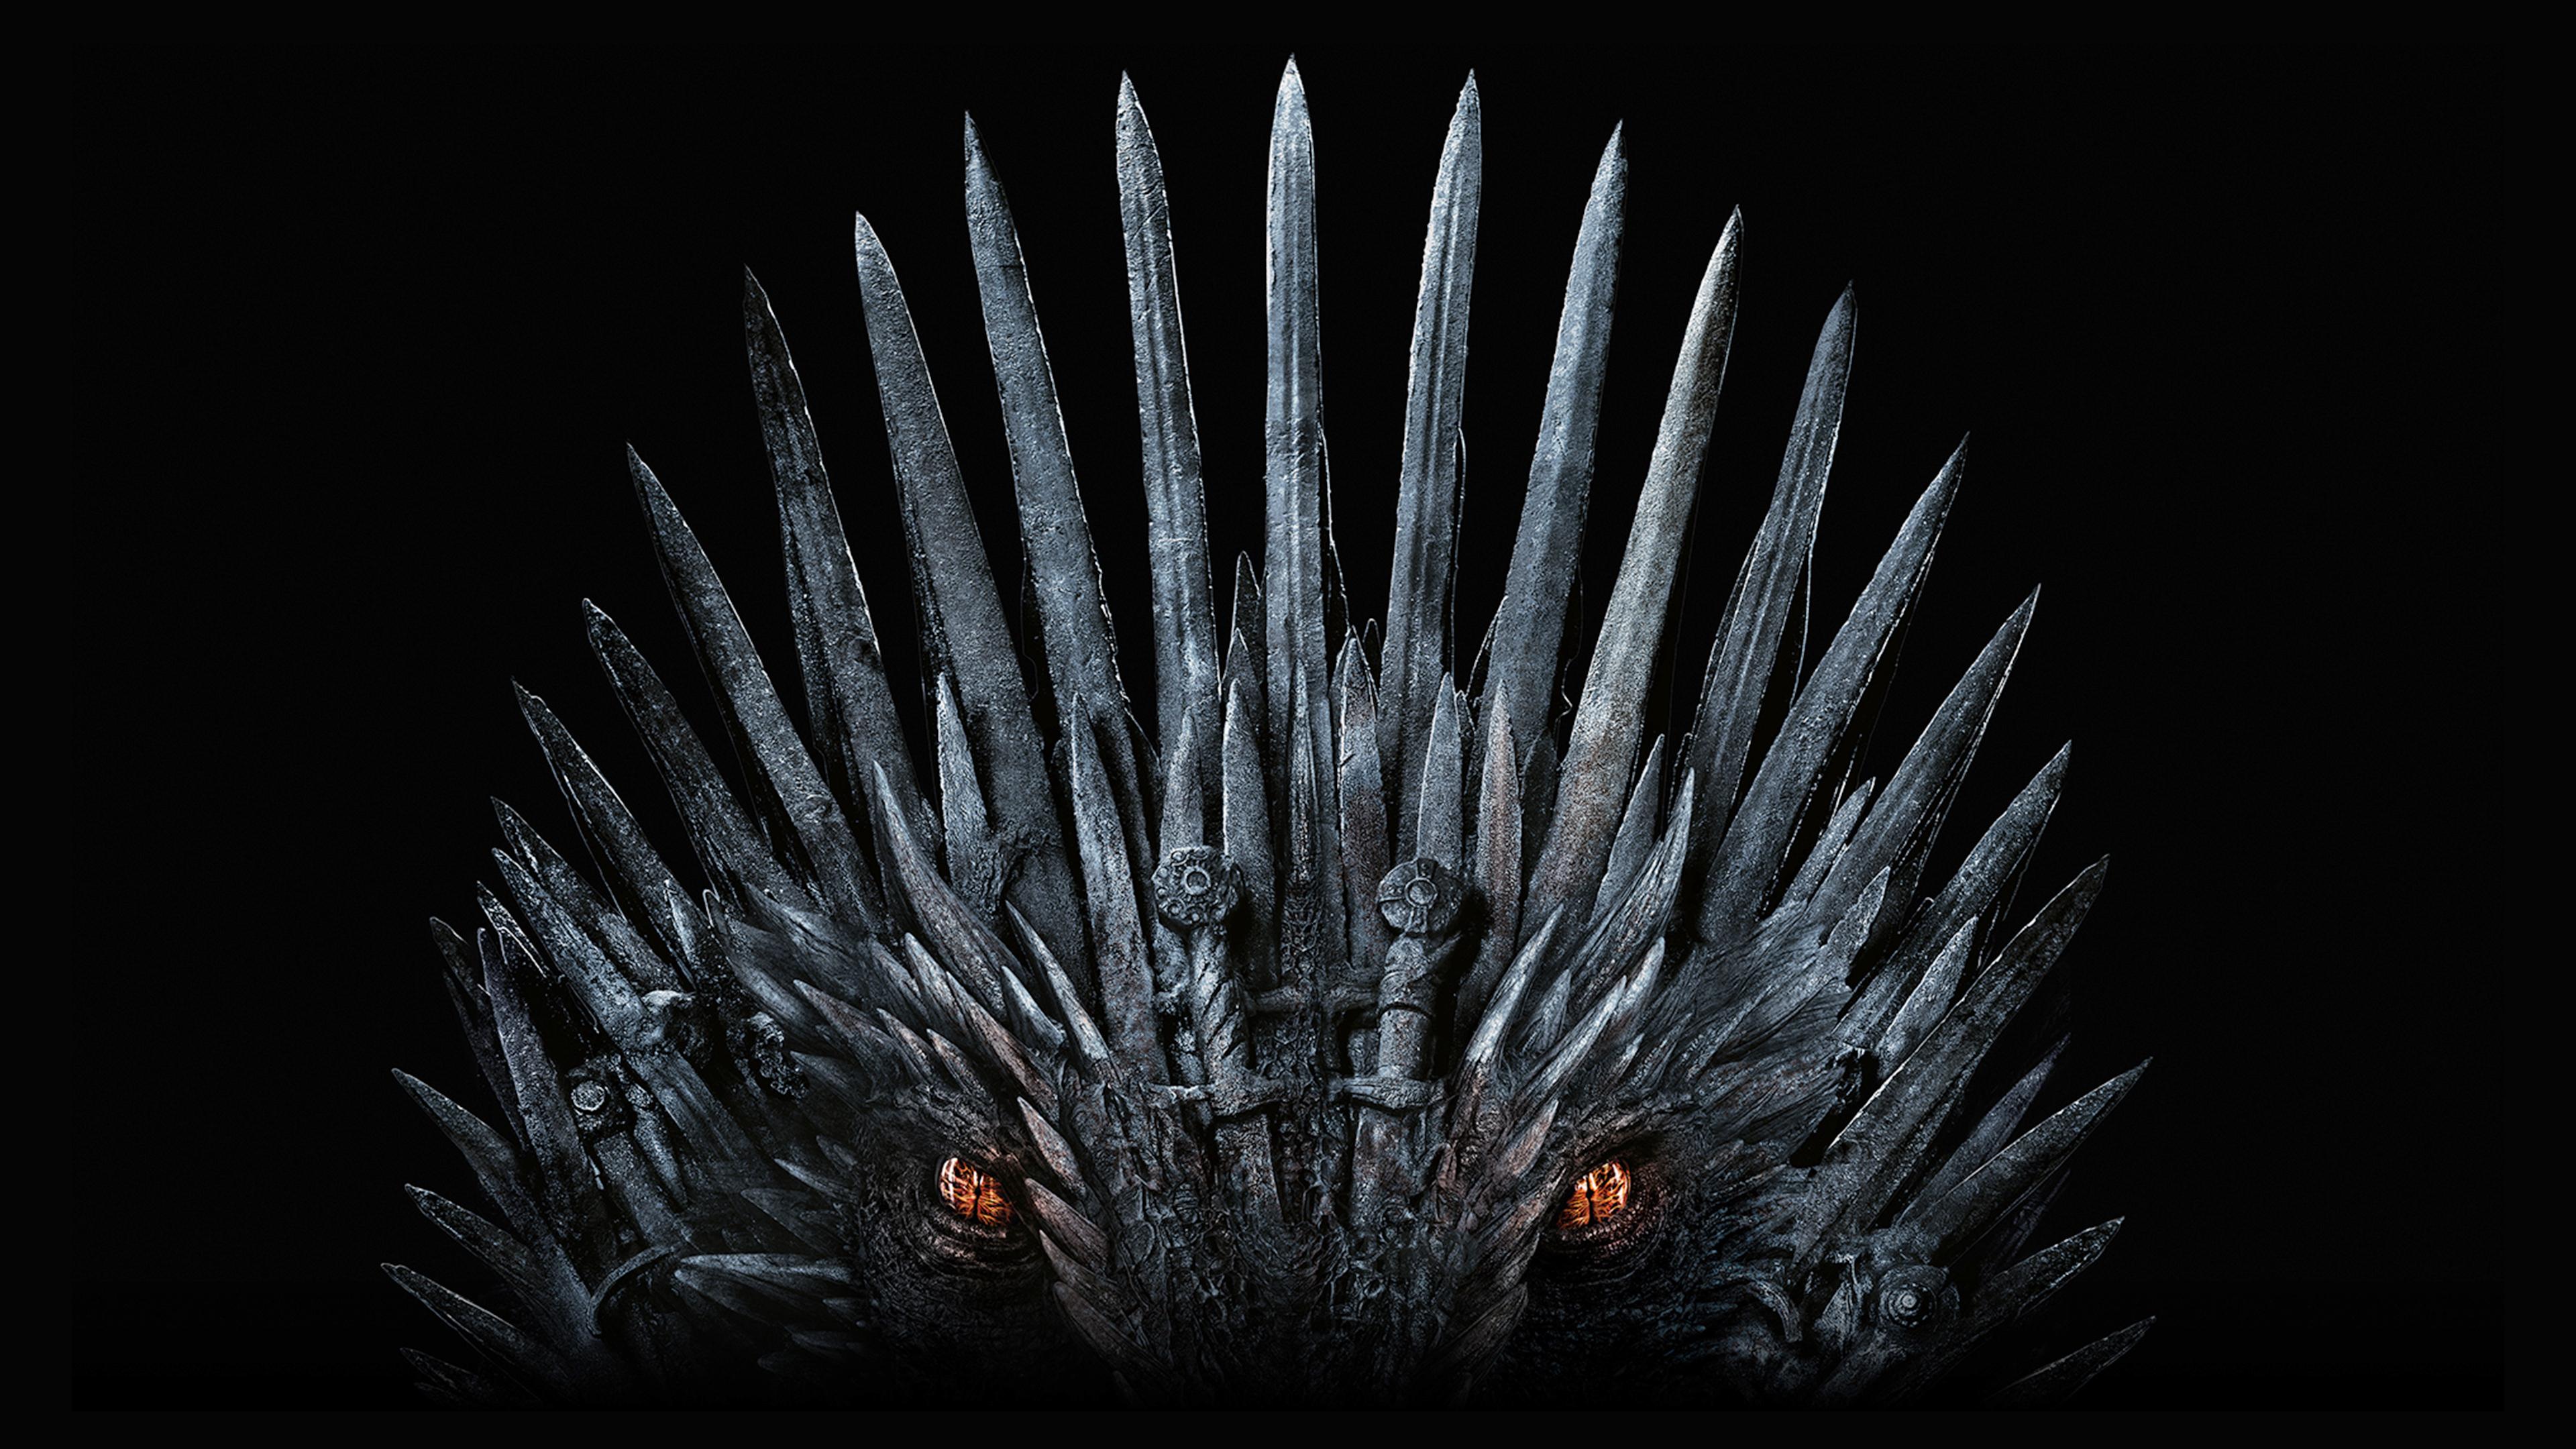 1280x1024 Game Of Thrones Season 8 1280x1024 Resolution